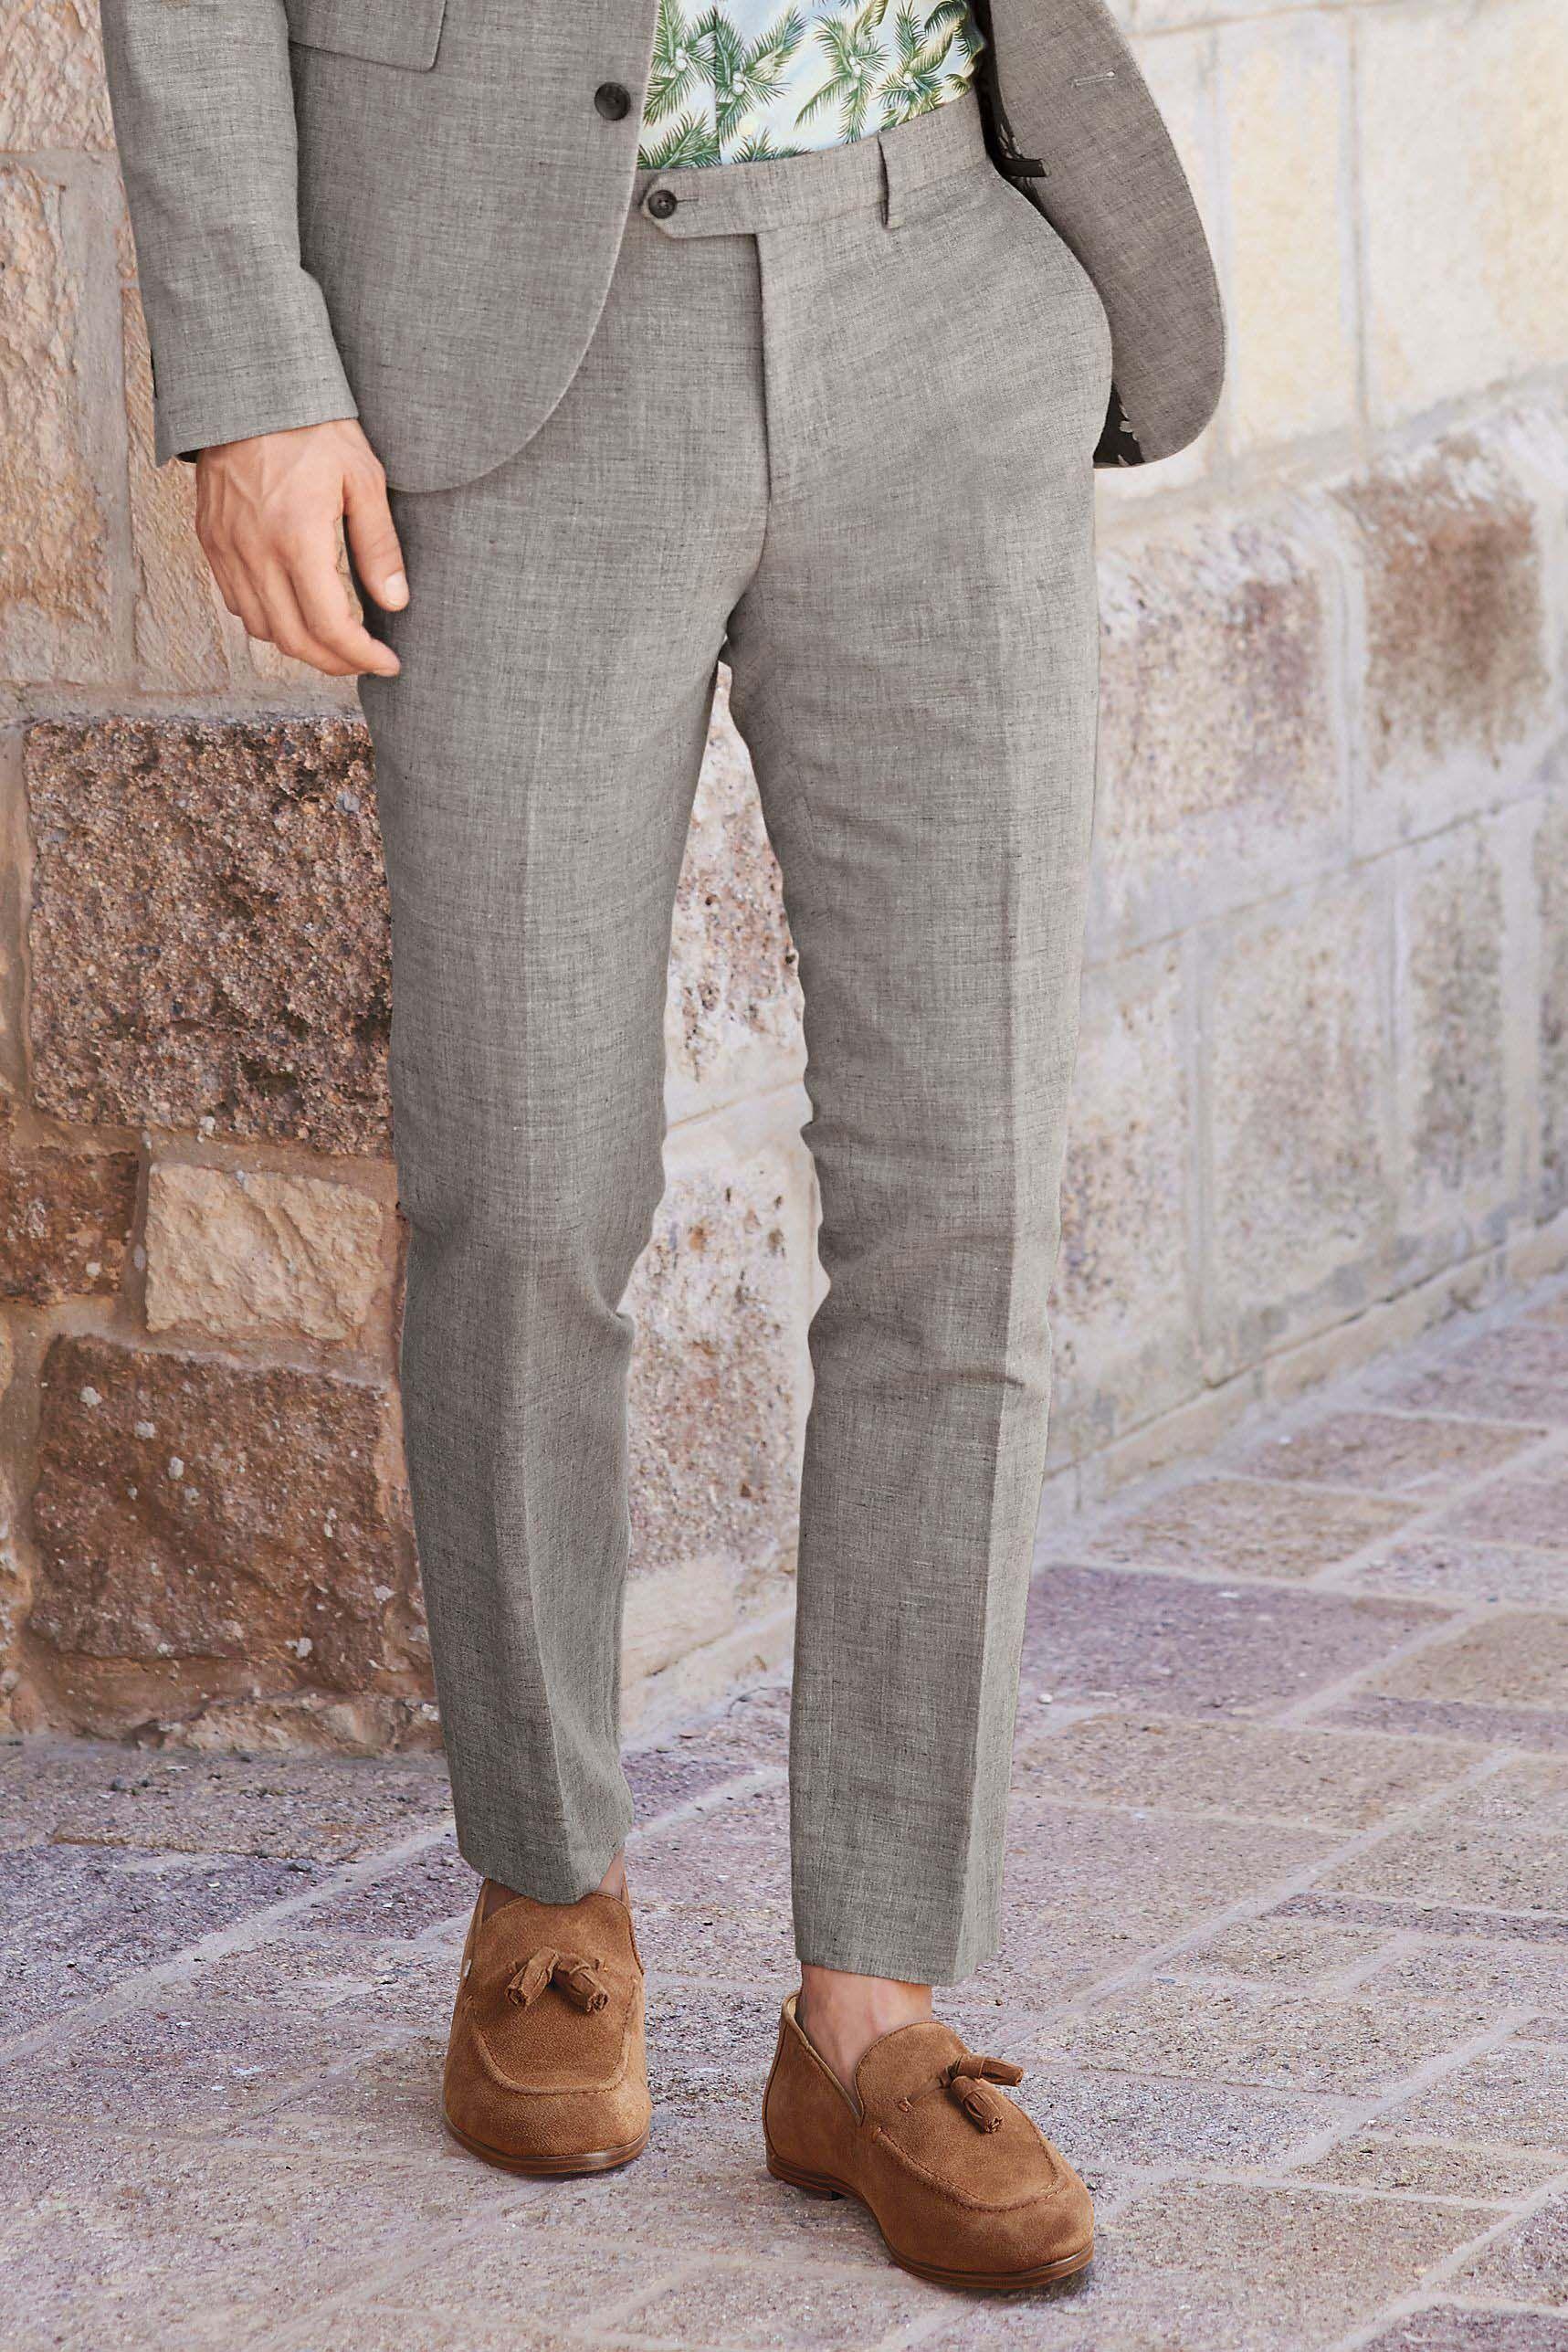 db522d33515a Mens Next Light Grey Skinny Fit Melange Linen Blend Suit: Trousers - Grey